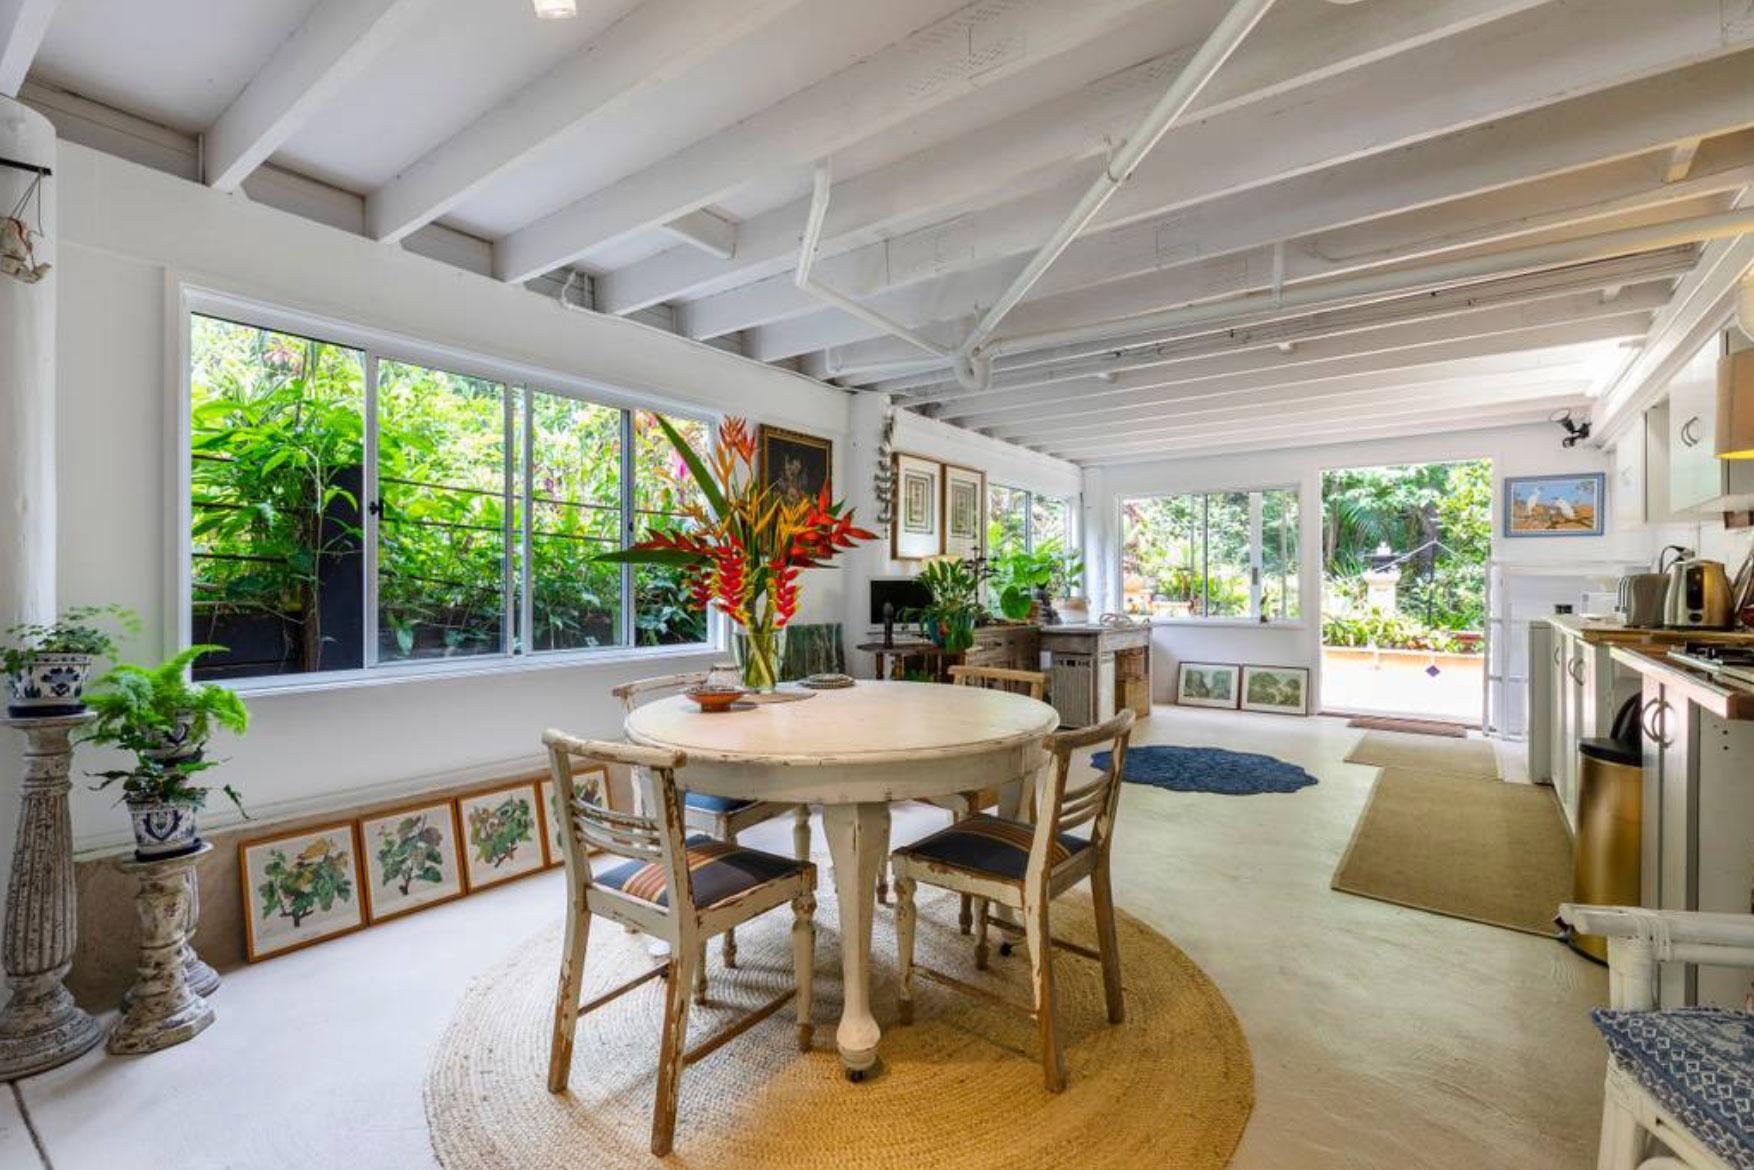 airbnb-apartment3.jpg